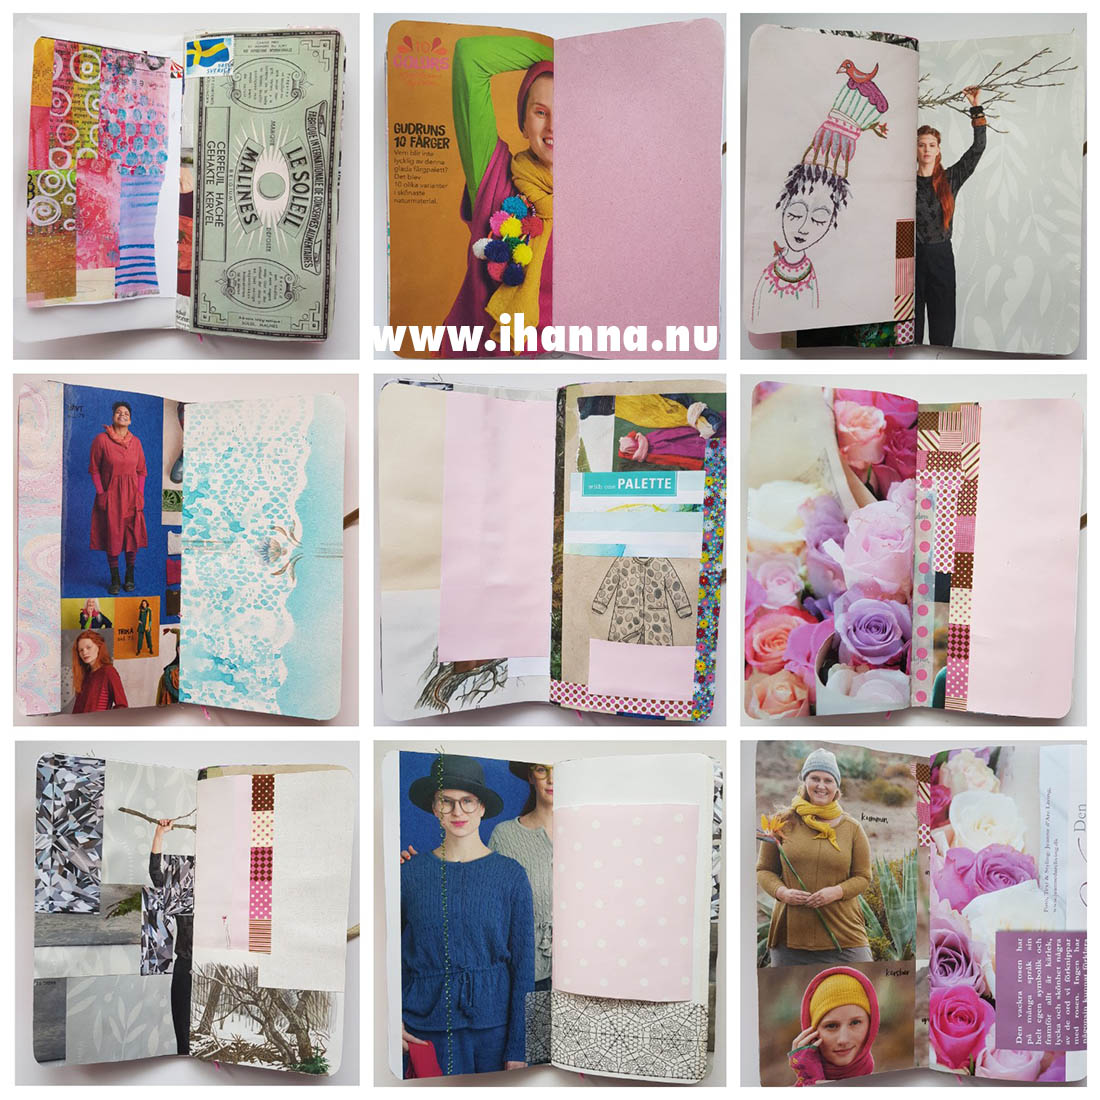 Junk Journal no 002 for sale by Studio iHanna Shop #junkjournal